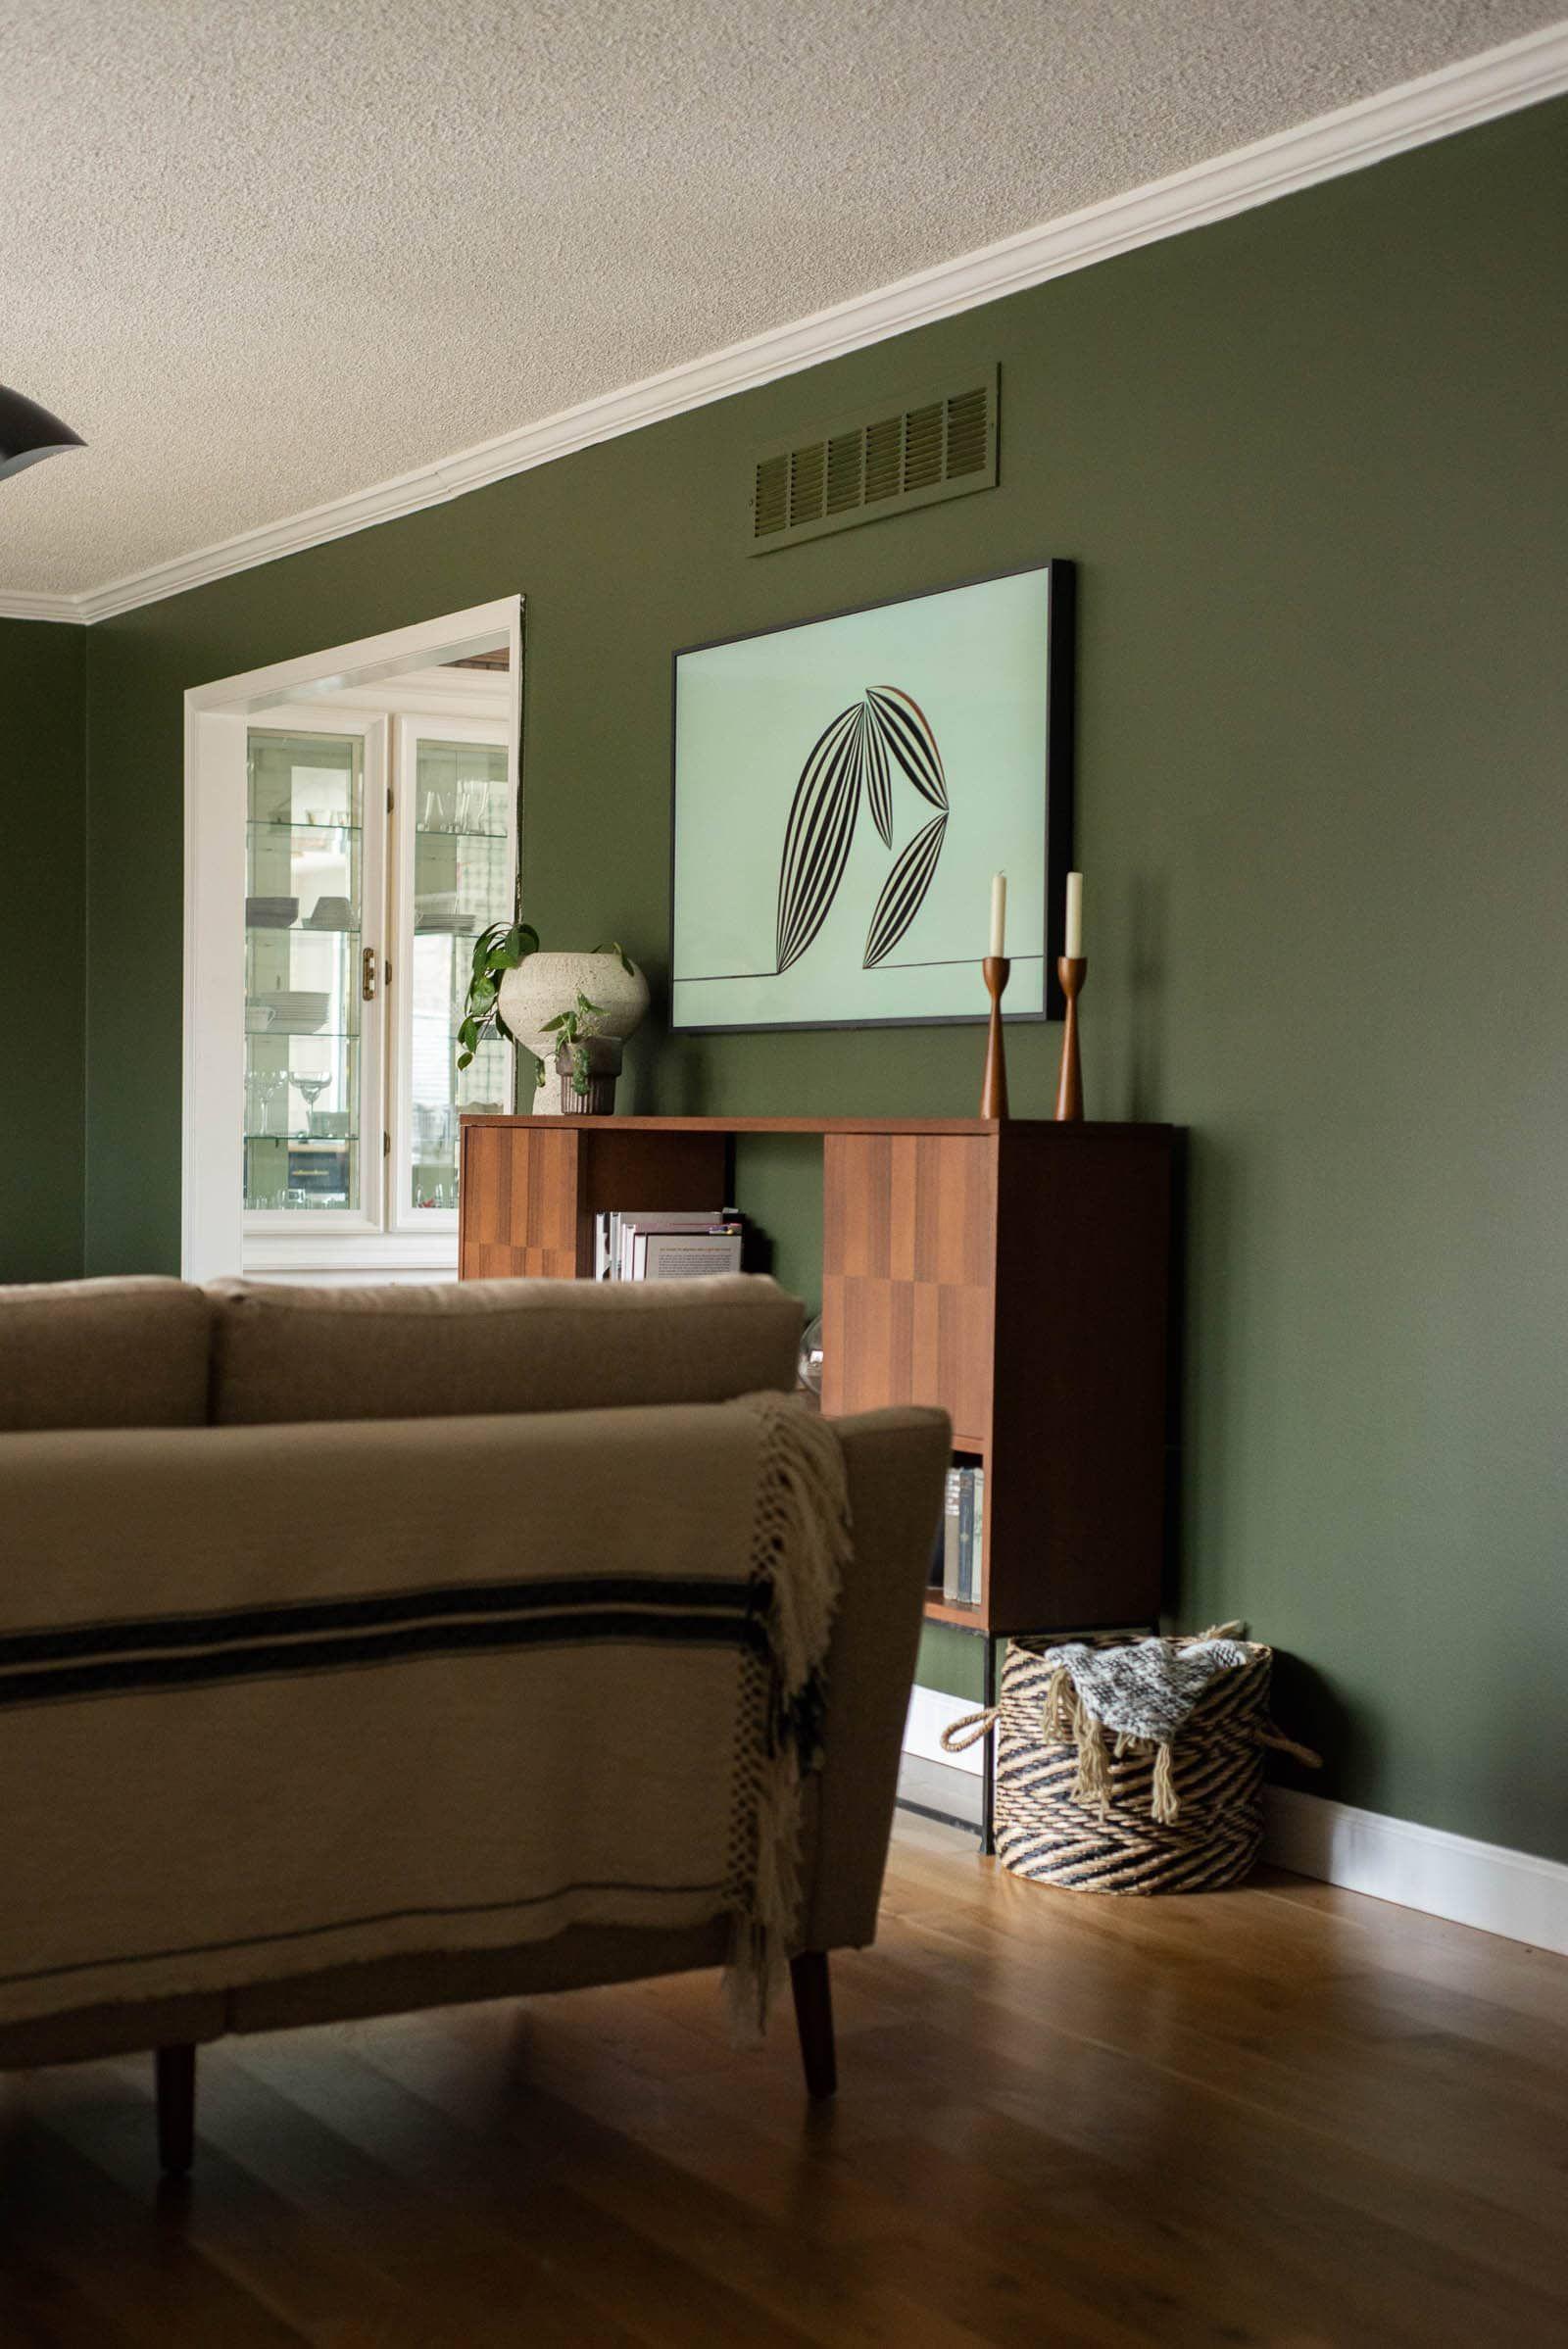 Forest Green Living Room Living Room Green Living Room Paint Living Room Designs Green color living room